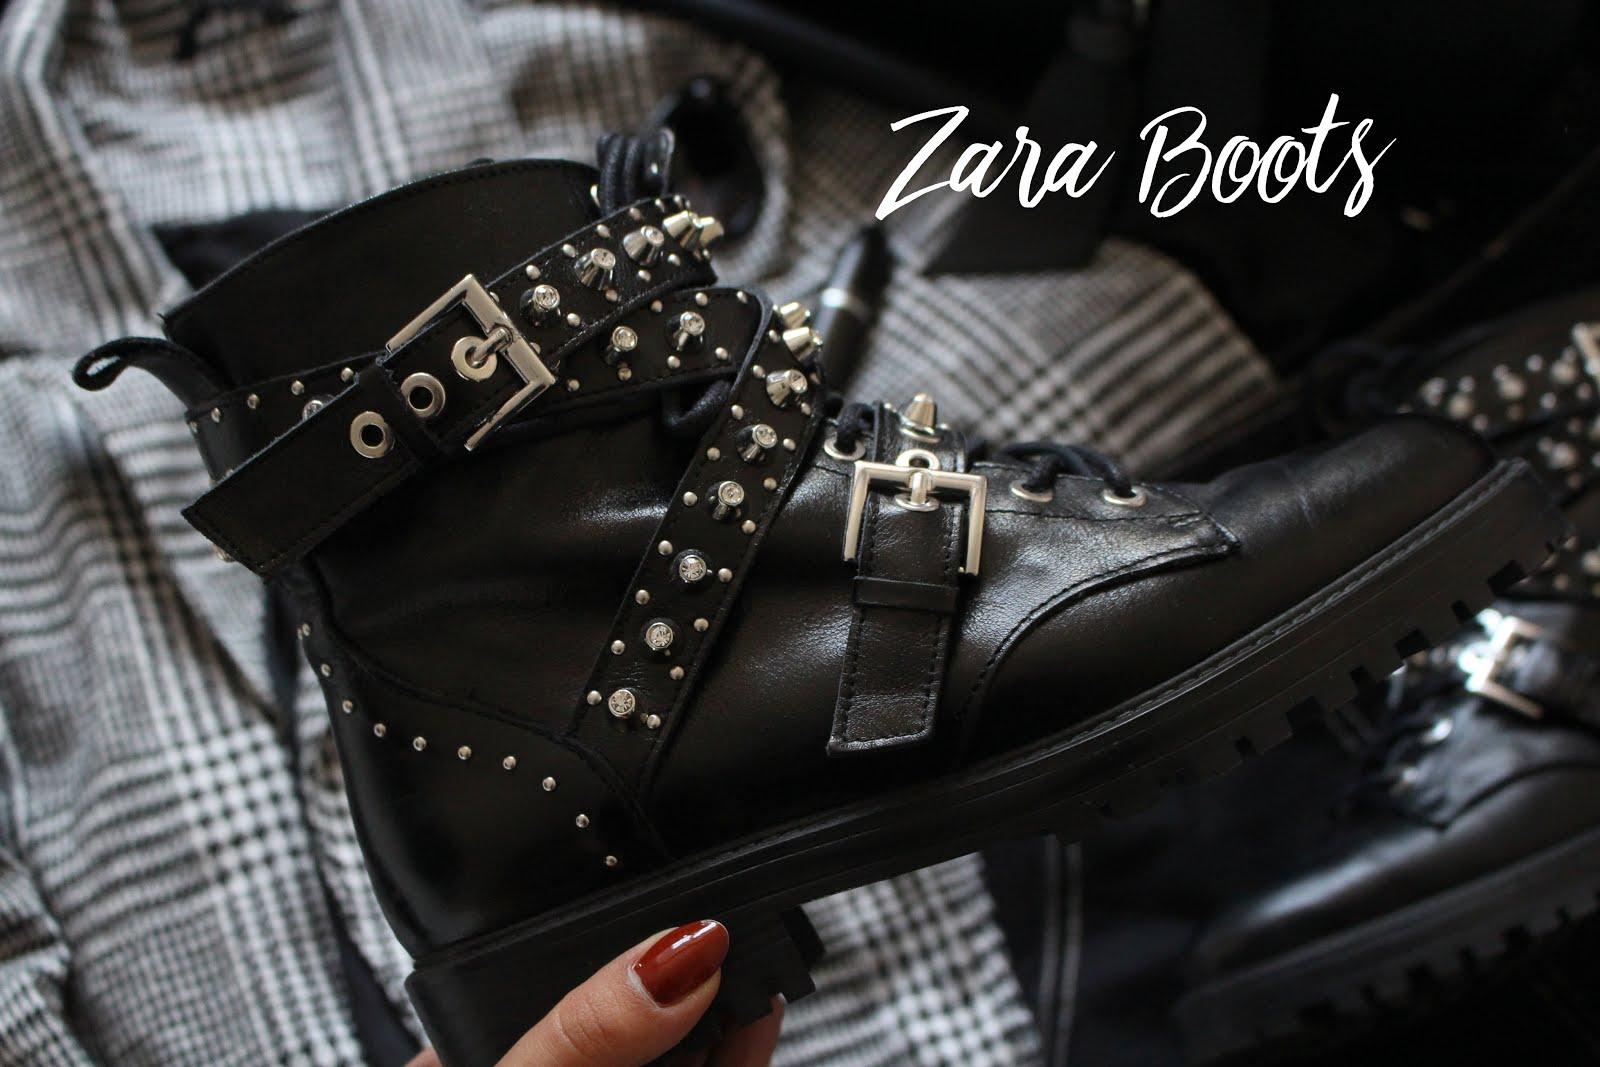 fashion, fashion blog, winter fashion essentials, zara biker boots, zara boots, fashion post, nelly ray, nelly ray blog, blogger